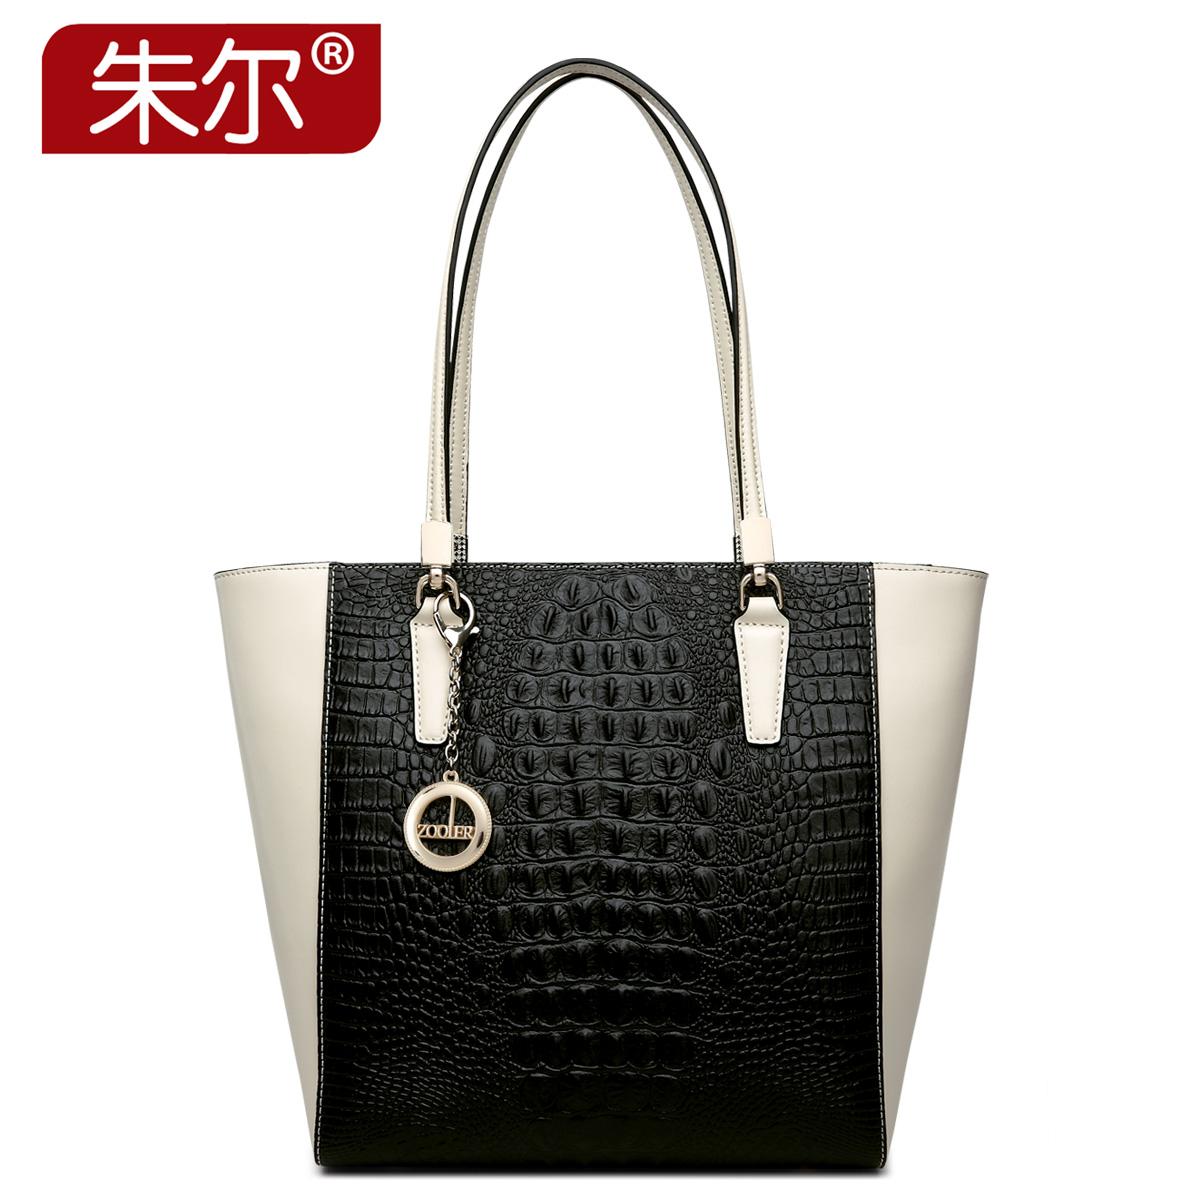 2015 women's one shoulder handbag fashion cowhide women's bags the trend of casual bag female shopping bag